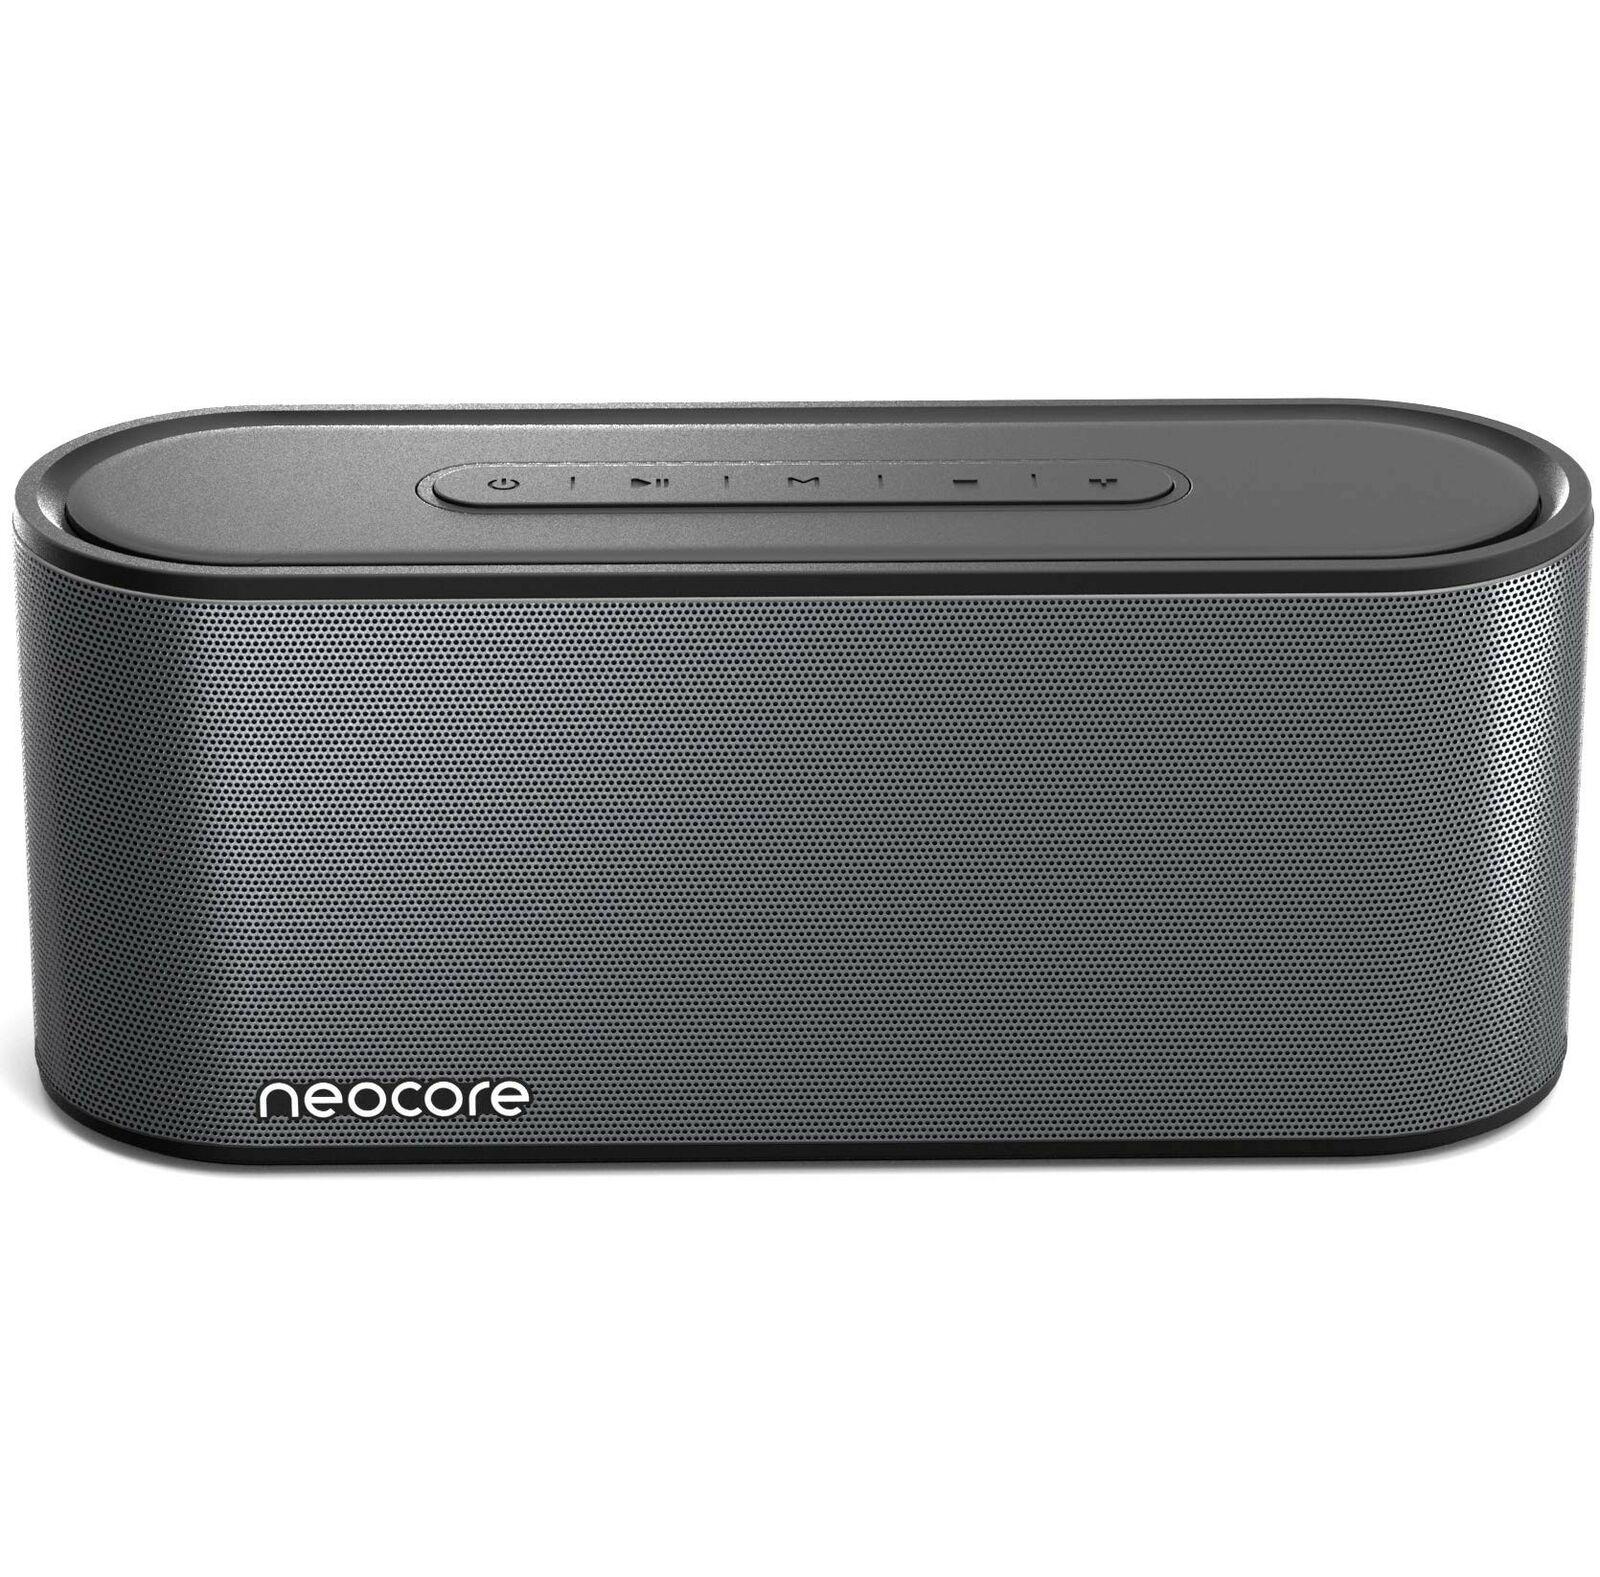 bolse 12w nfc wireless portable bluetooth speaker